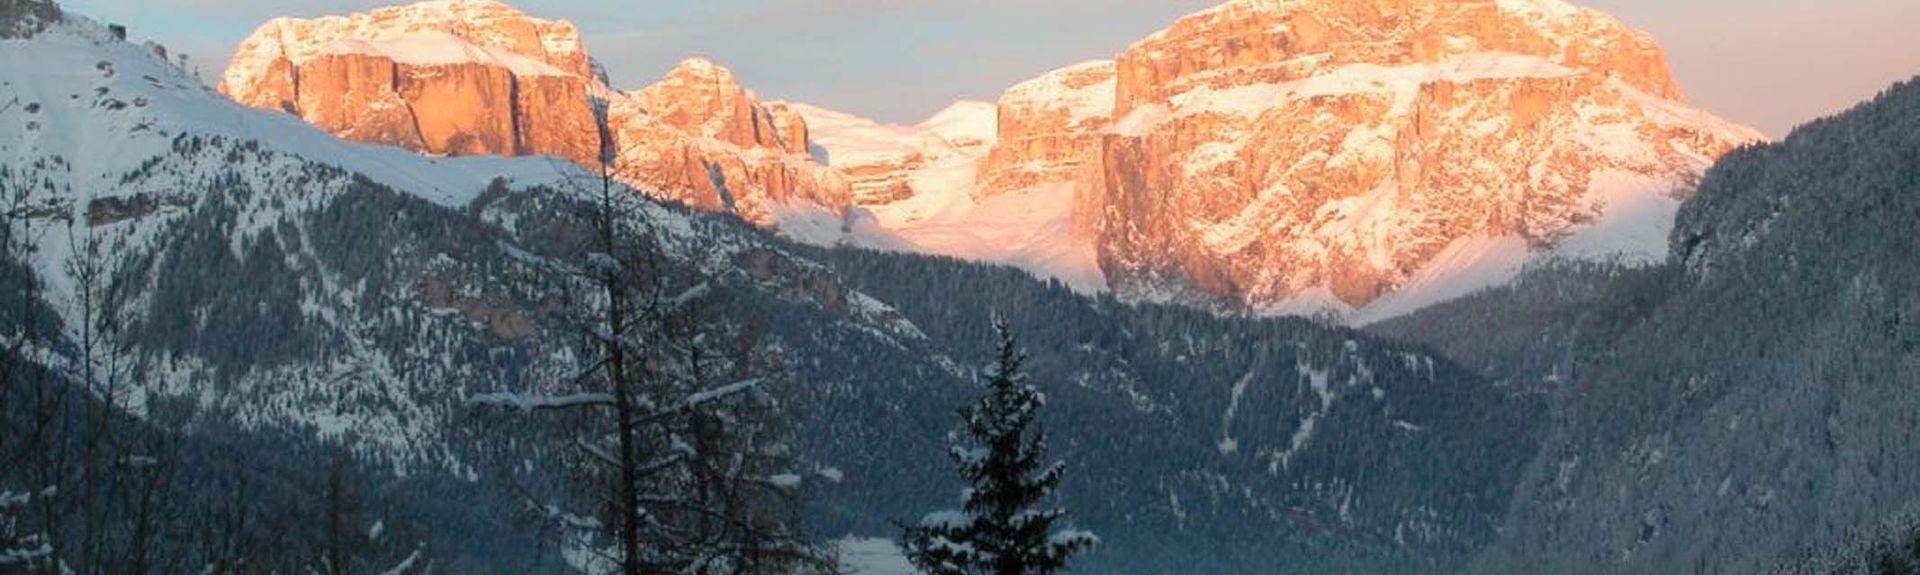 Predazzo, Trento, Trentino-Alto Adige/South Tyrol, Italy